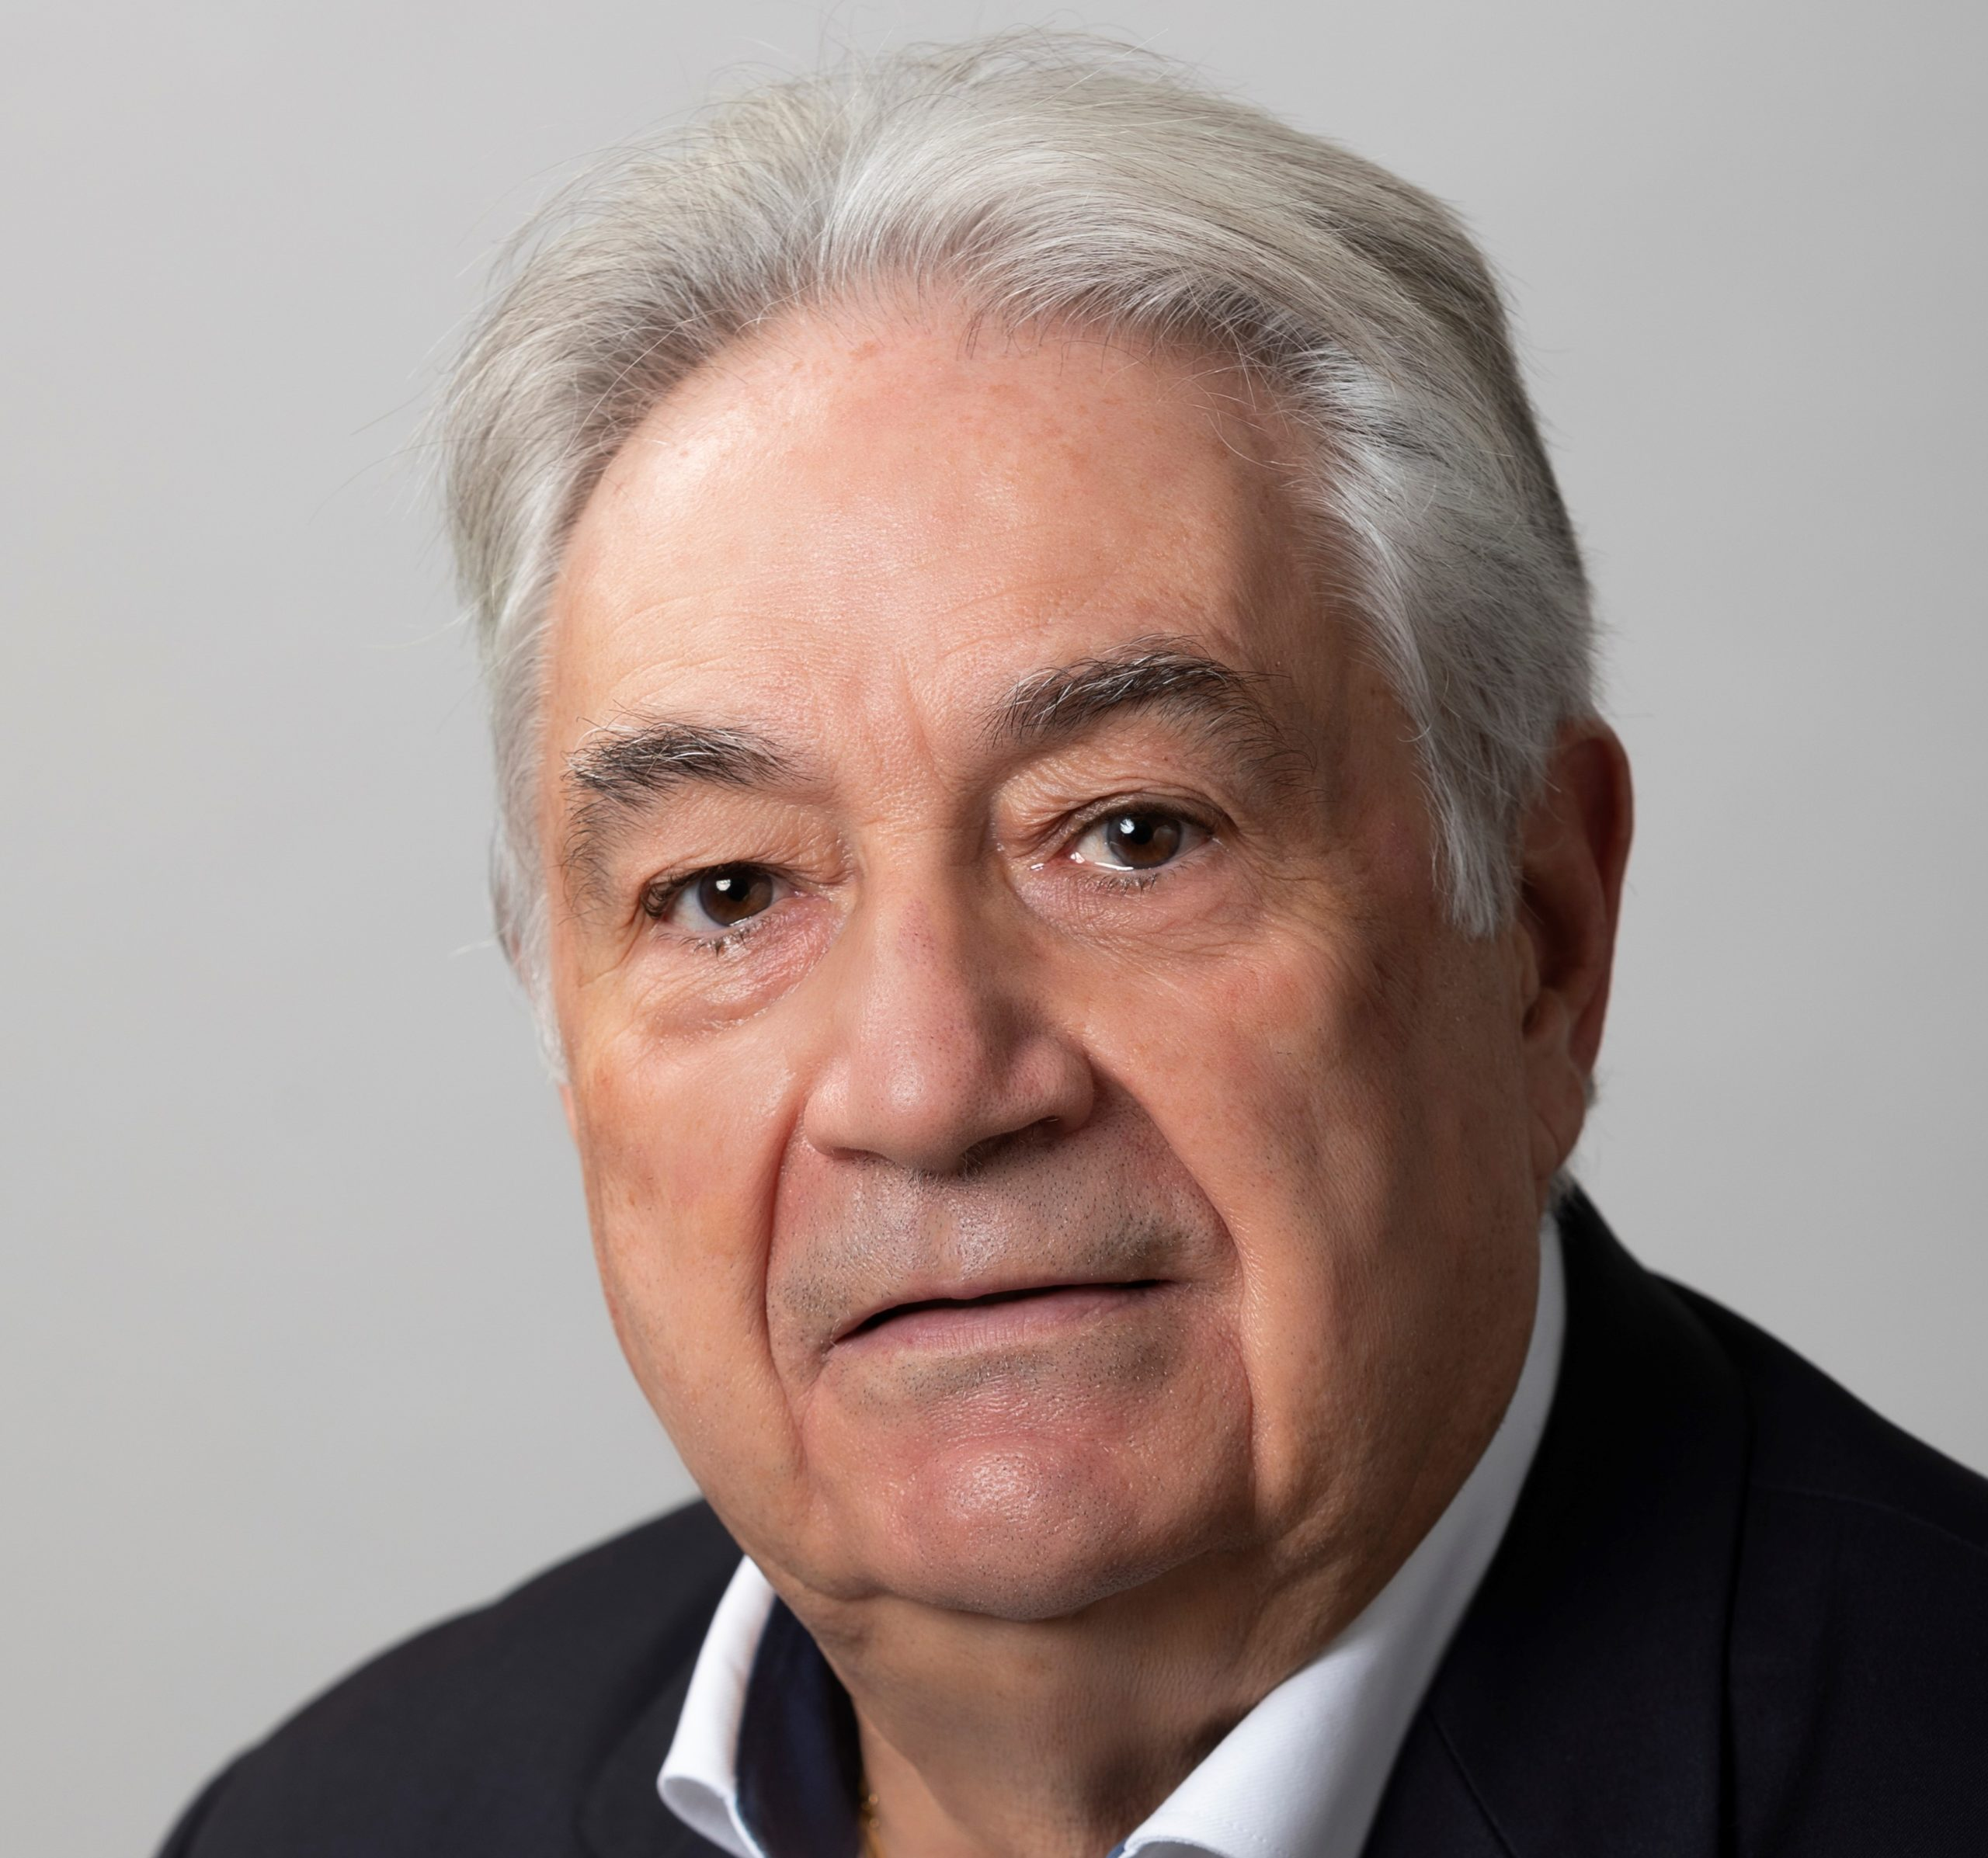 Maurice Ronat